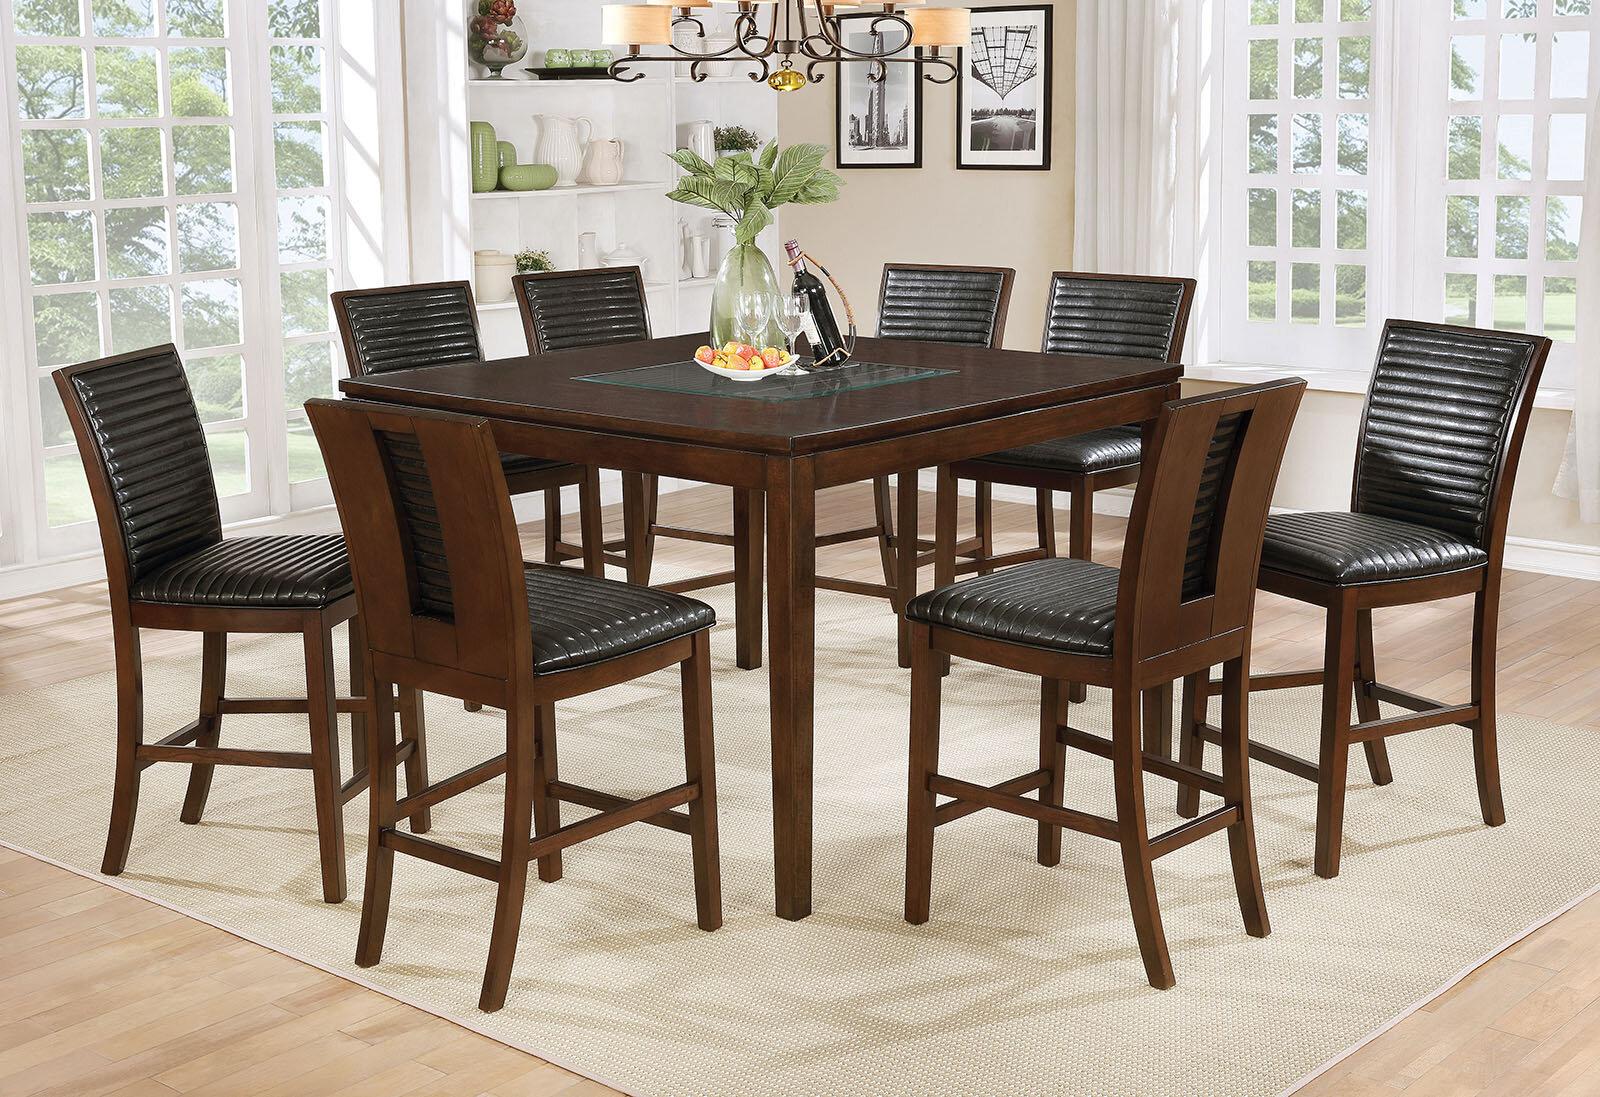 Darby Home Co Luz 9 Piece Pub Table Set | Wayfair